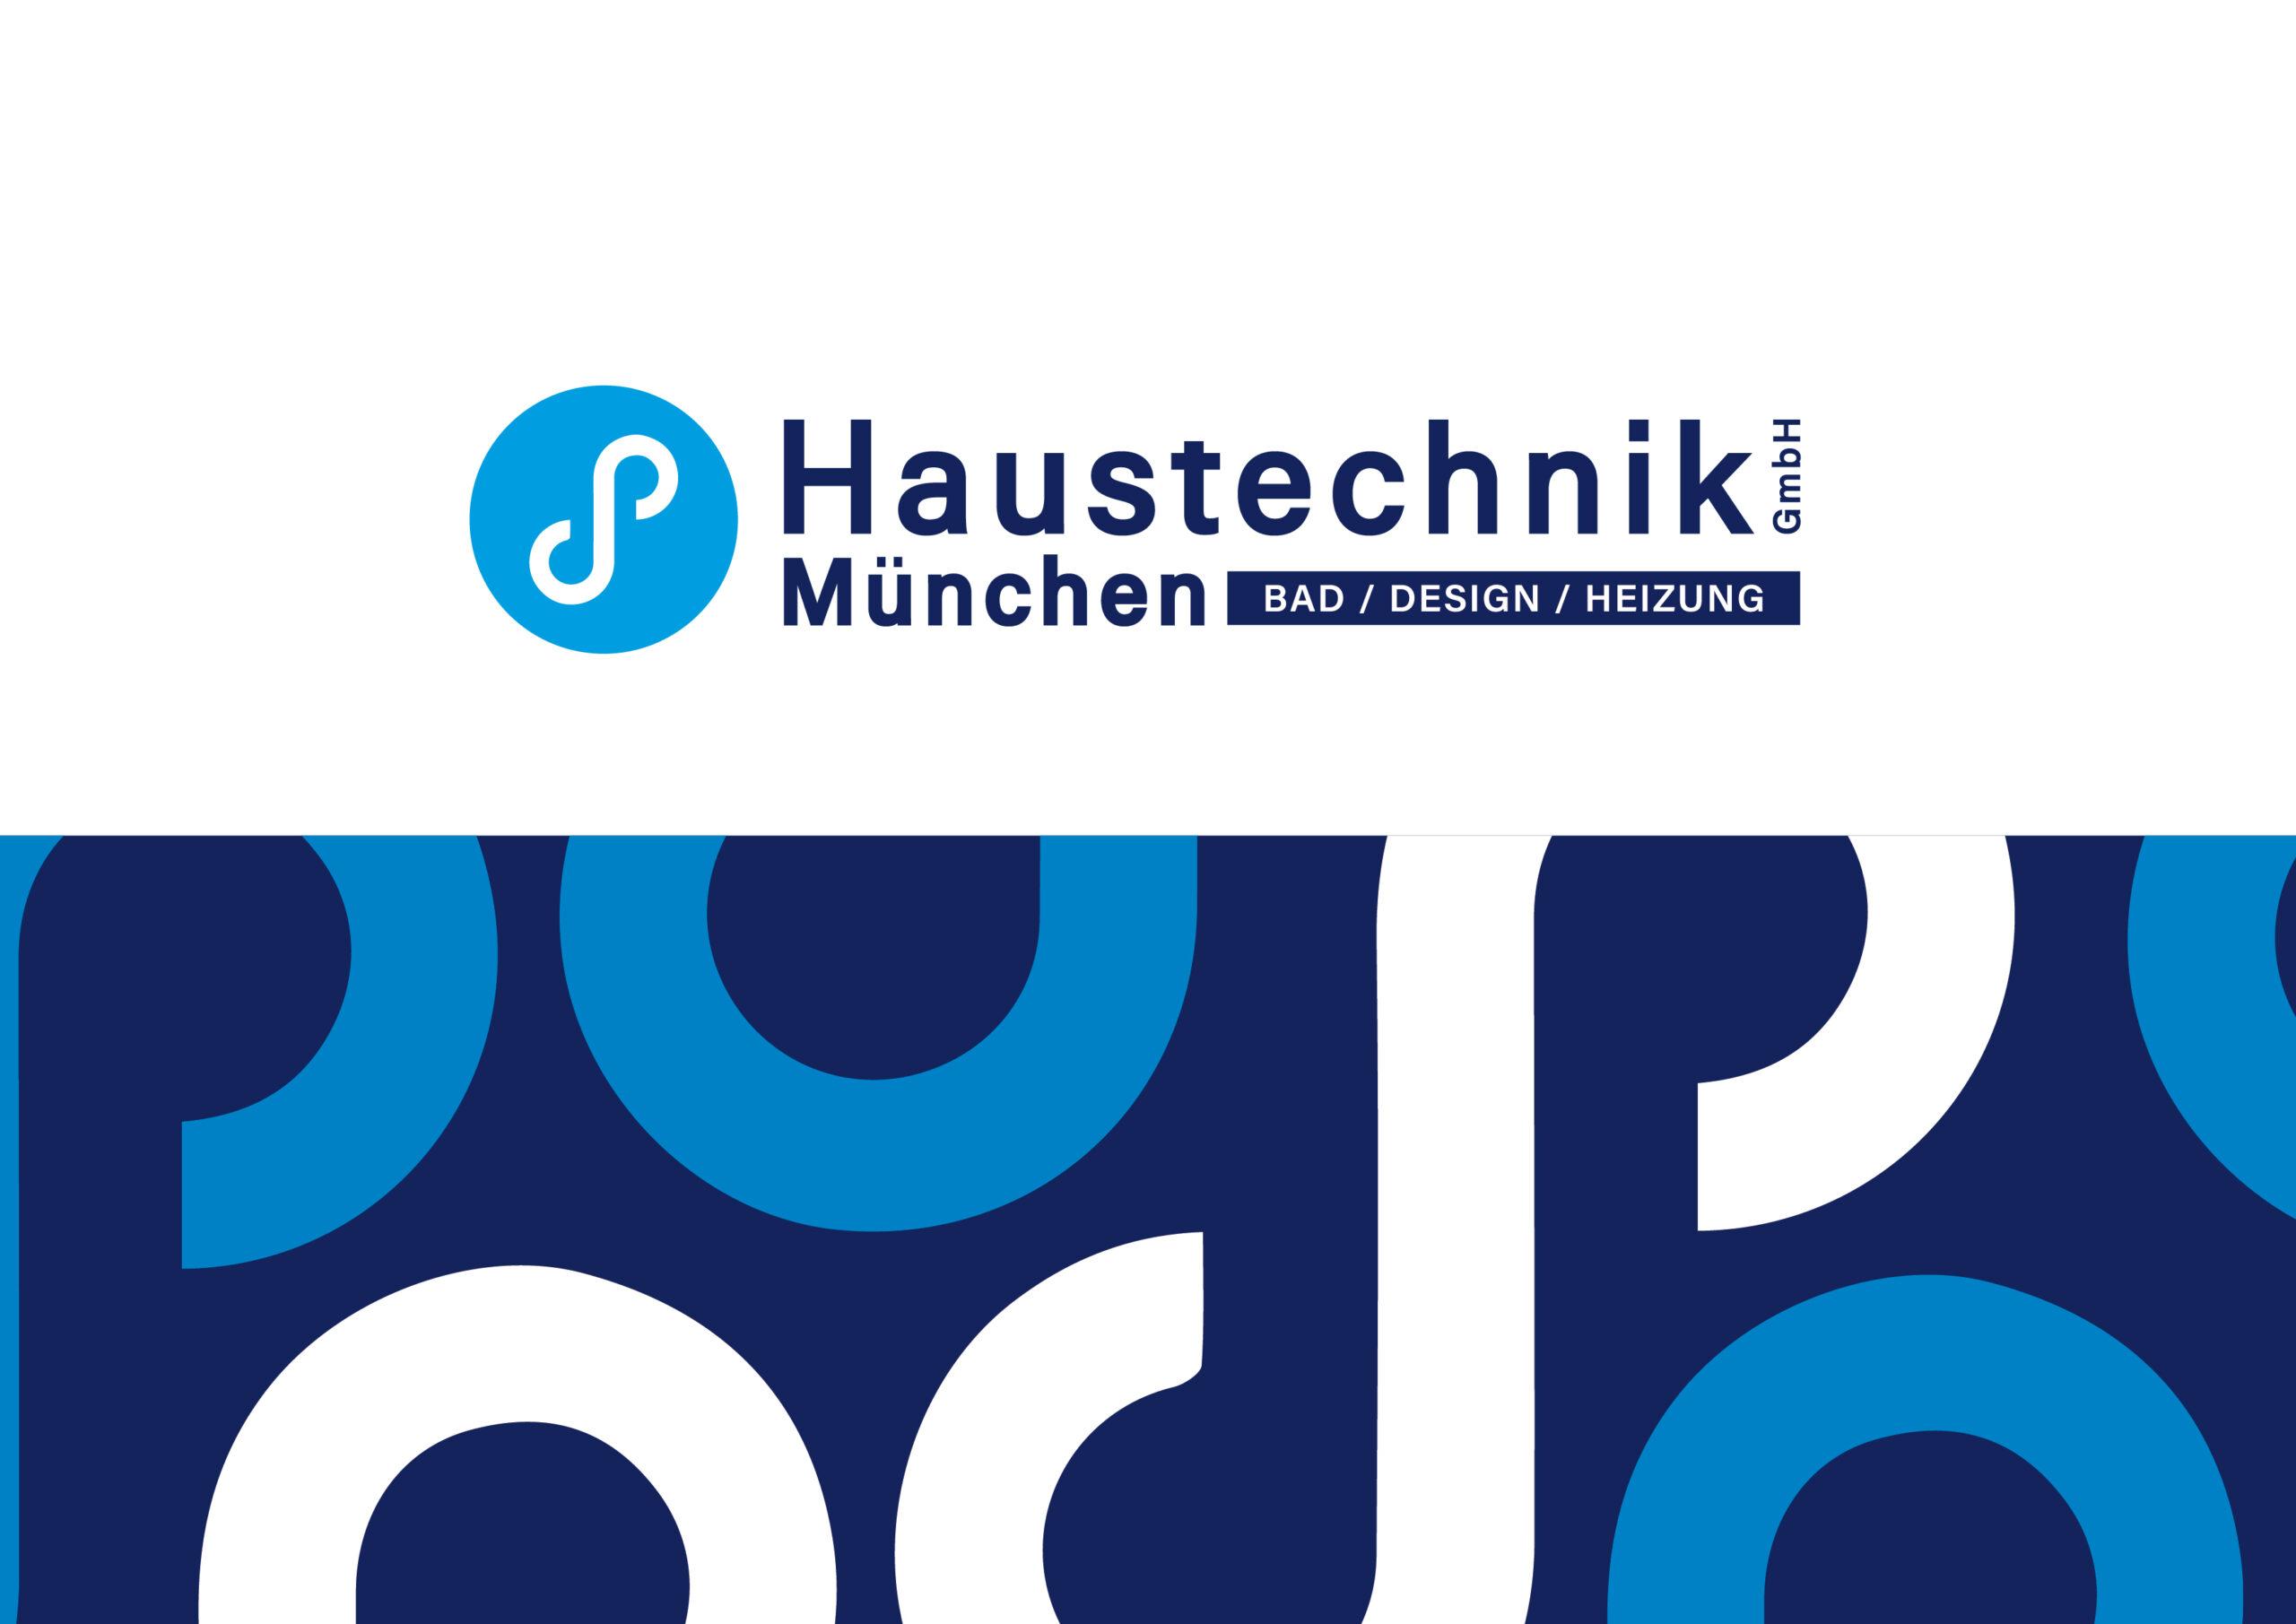 Corporate Design JP Haustechnik